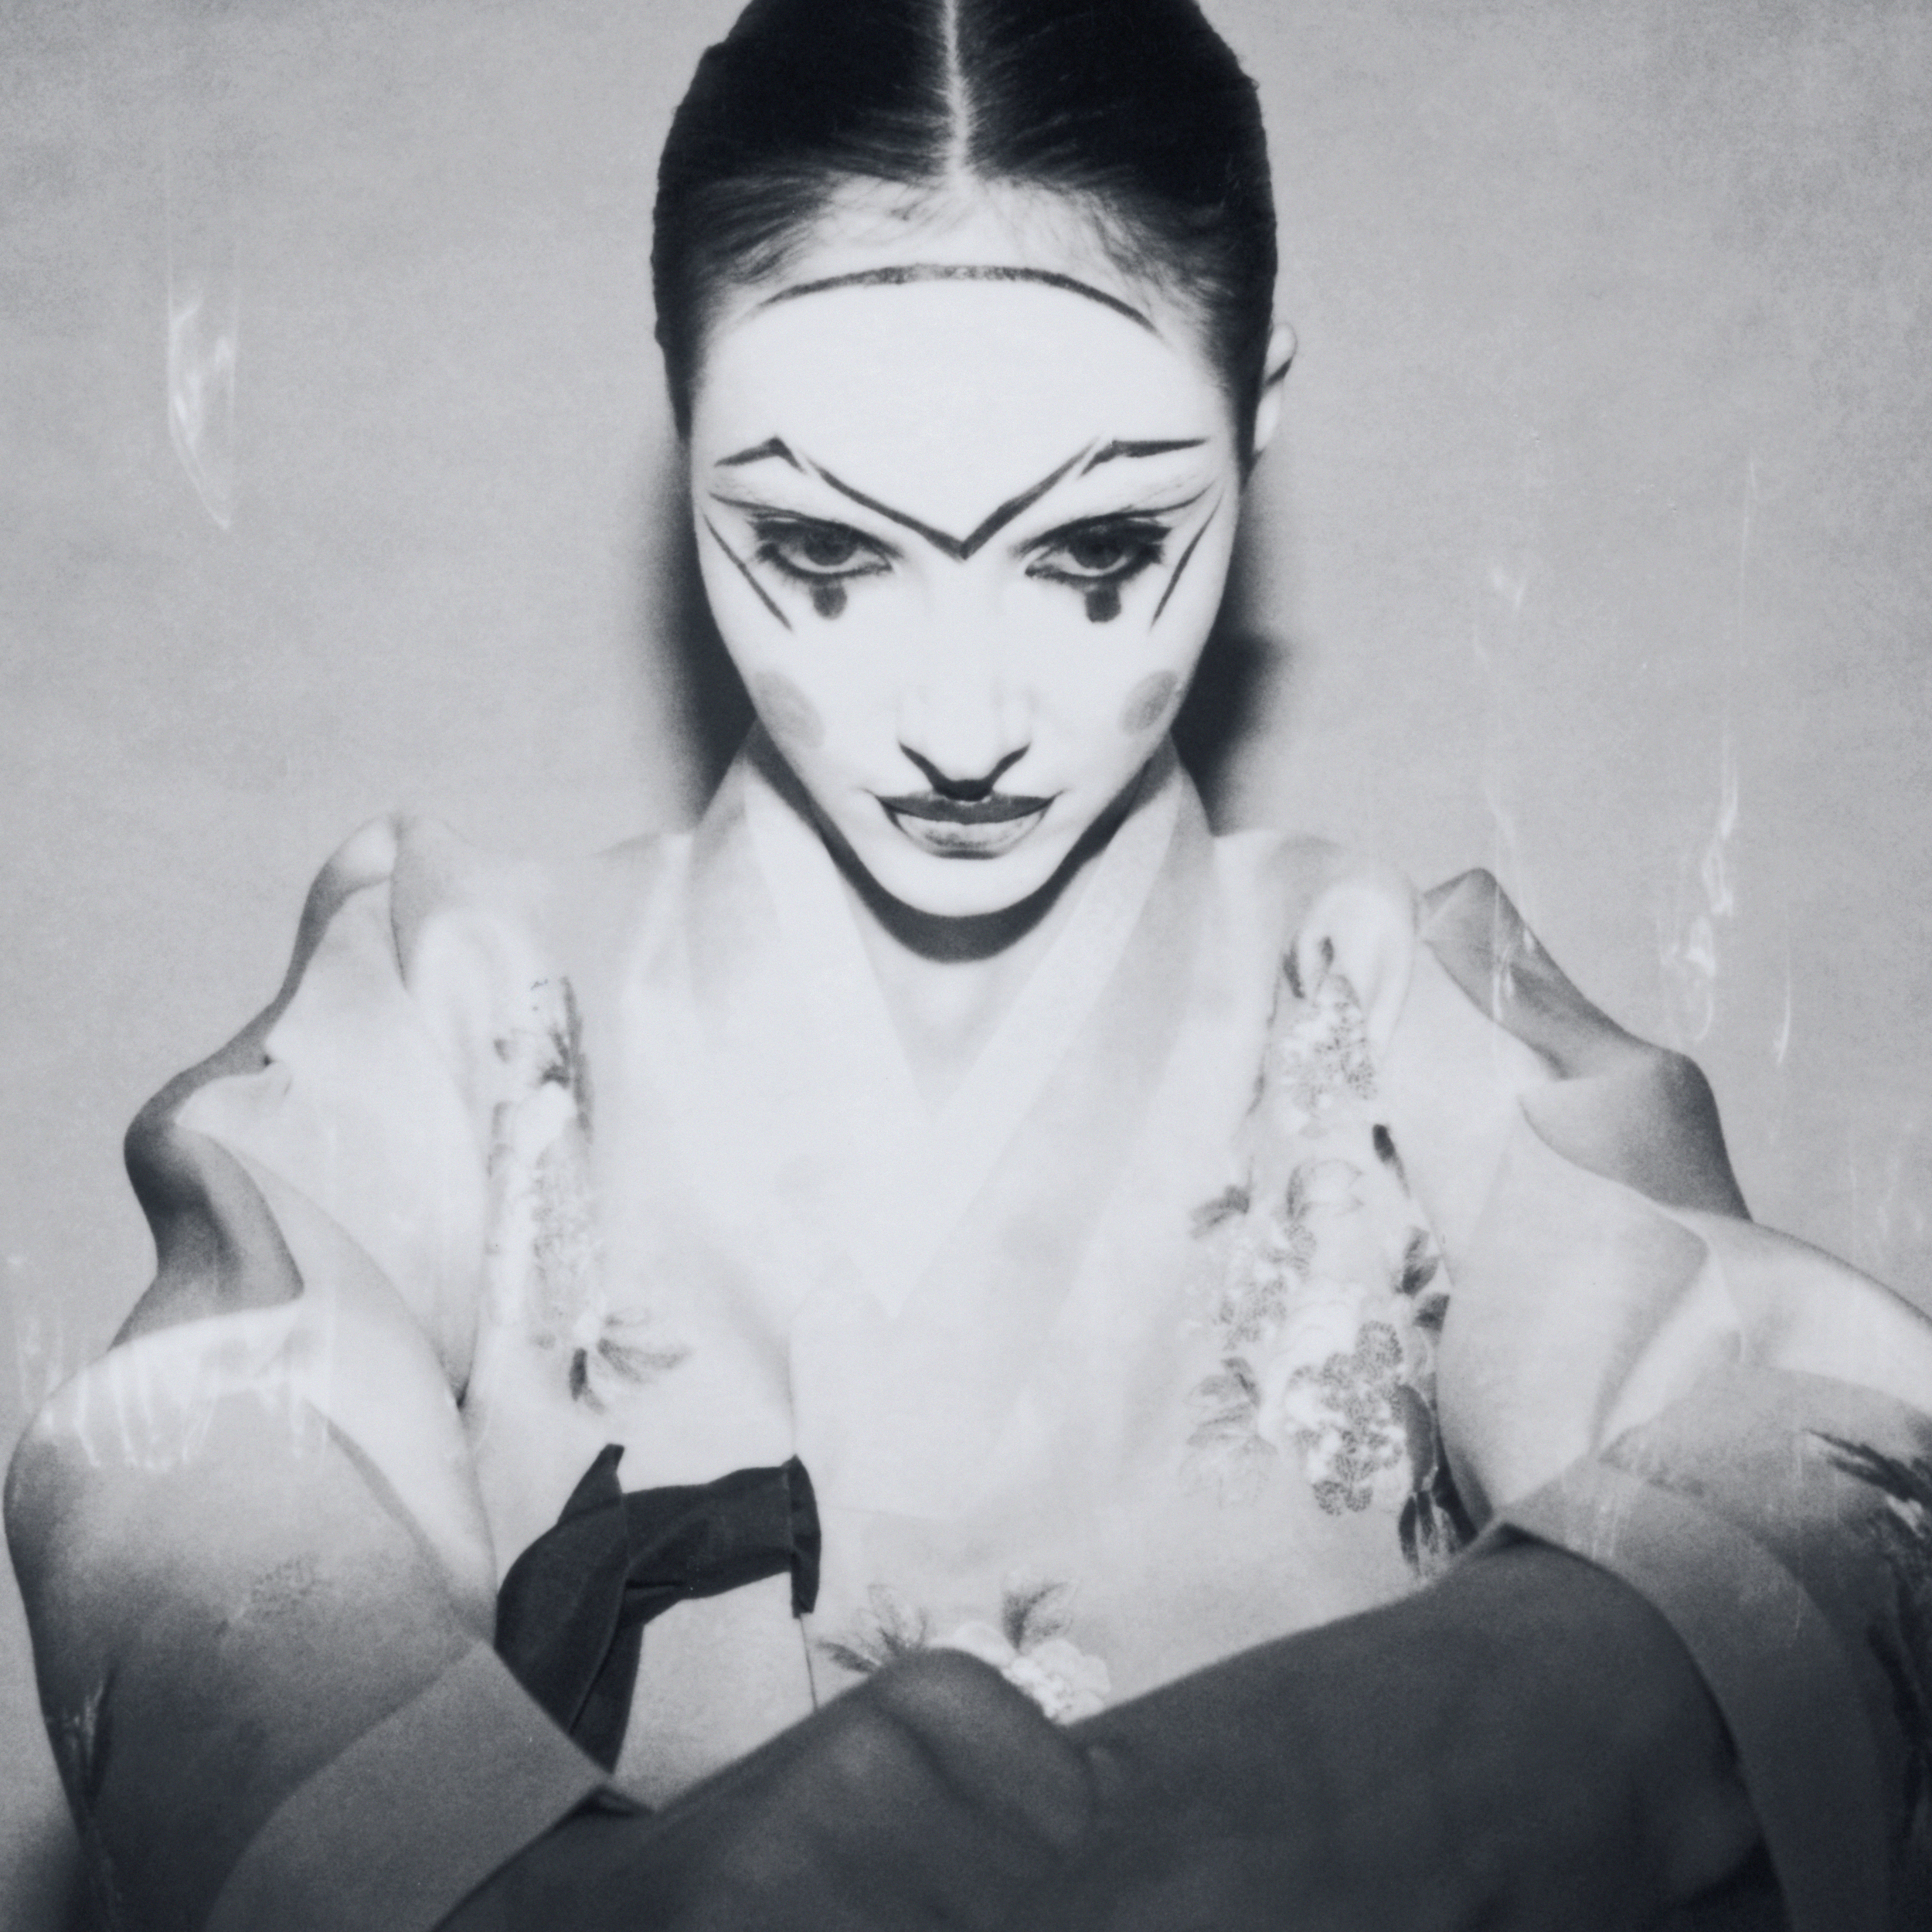 202 - Samantha Robinson - Pola - Low Res.jpeg